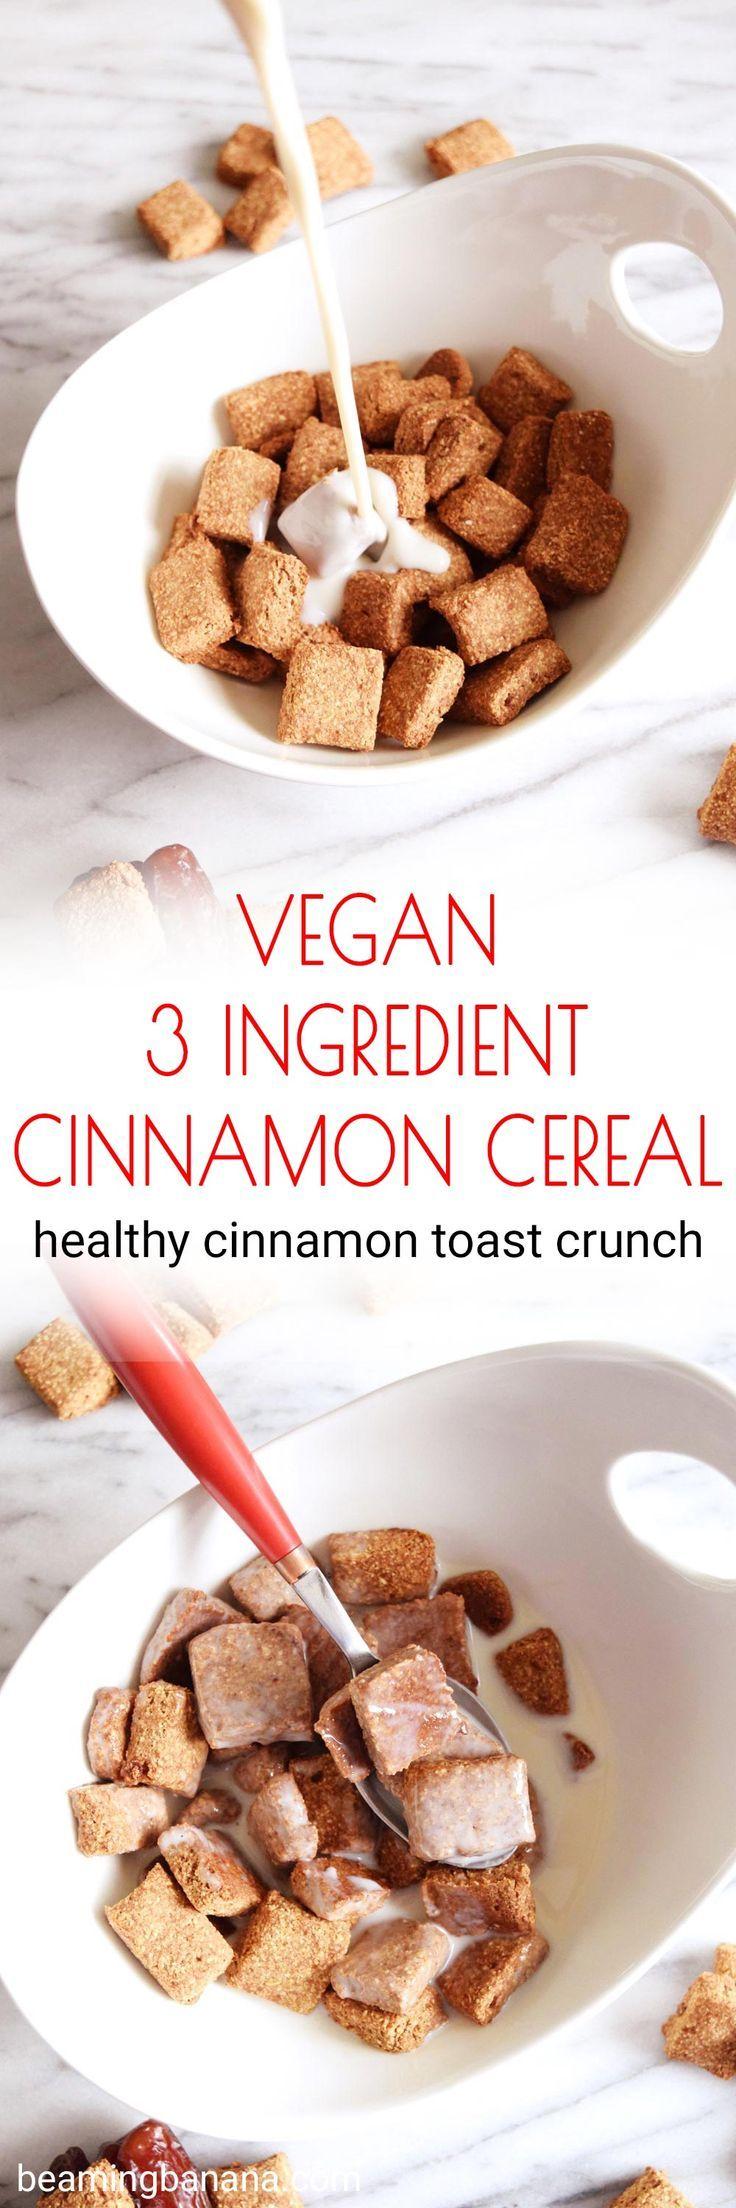 Vegan 3 Ingredient Cinnamon Cereal Recipe Cinnamon